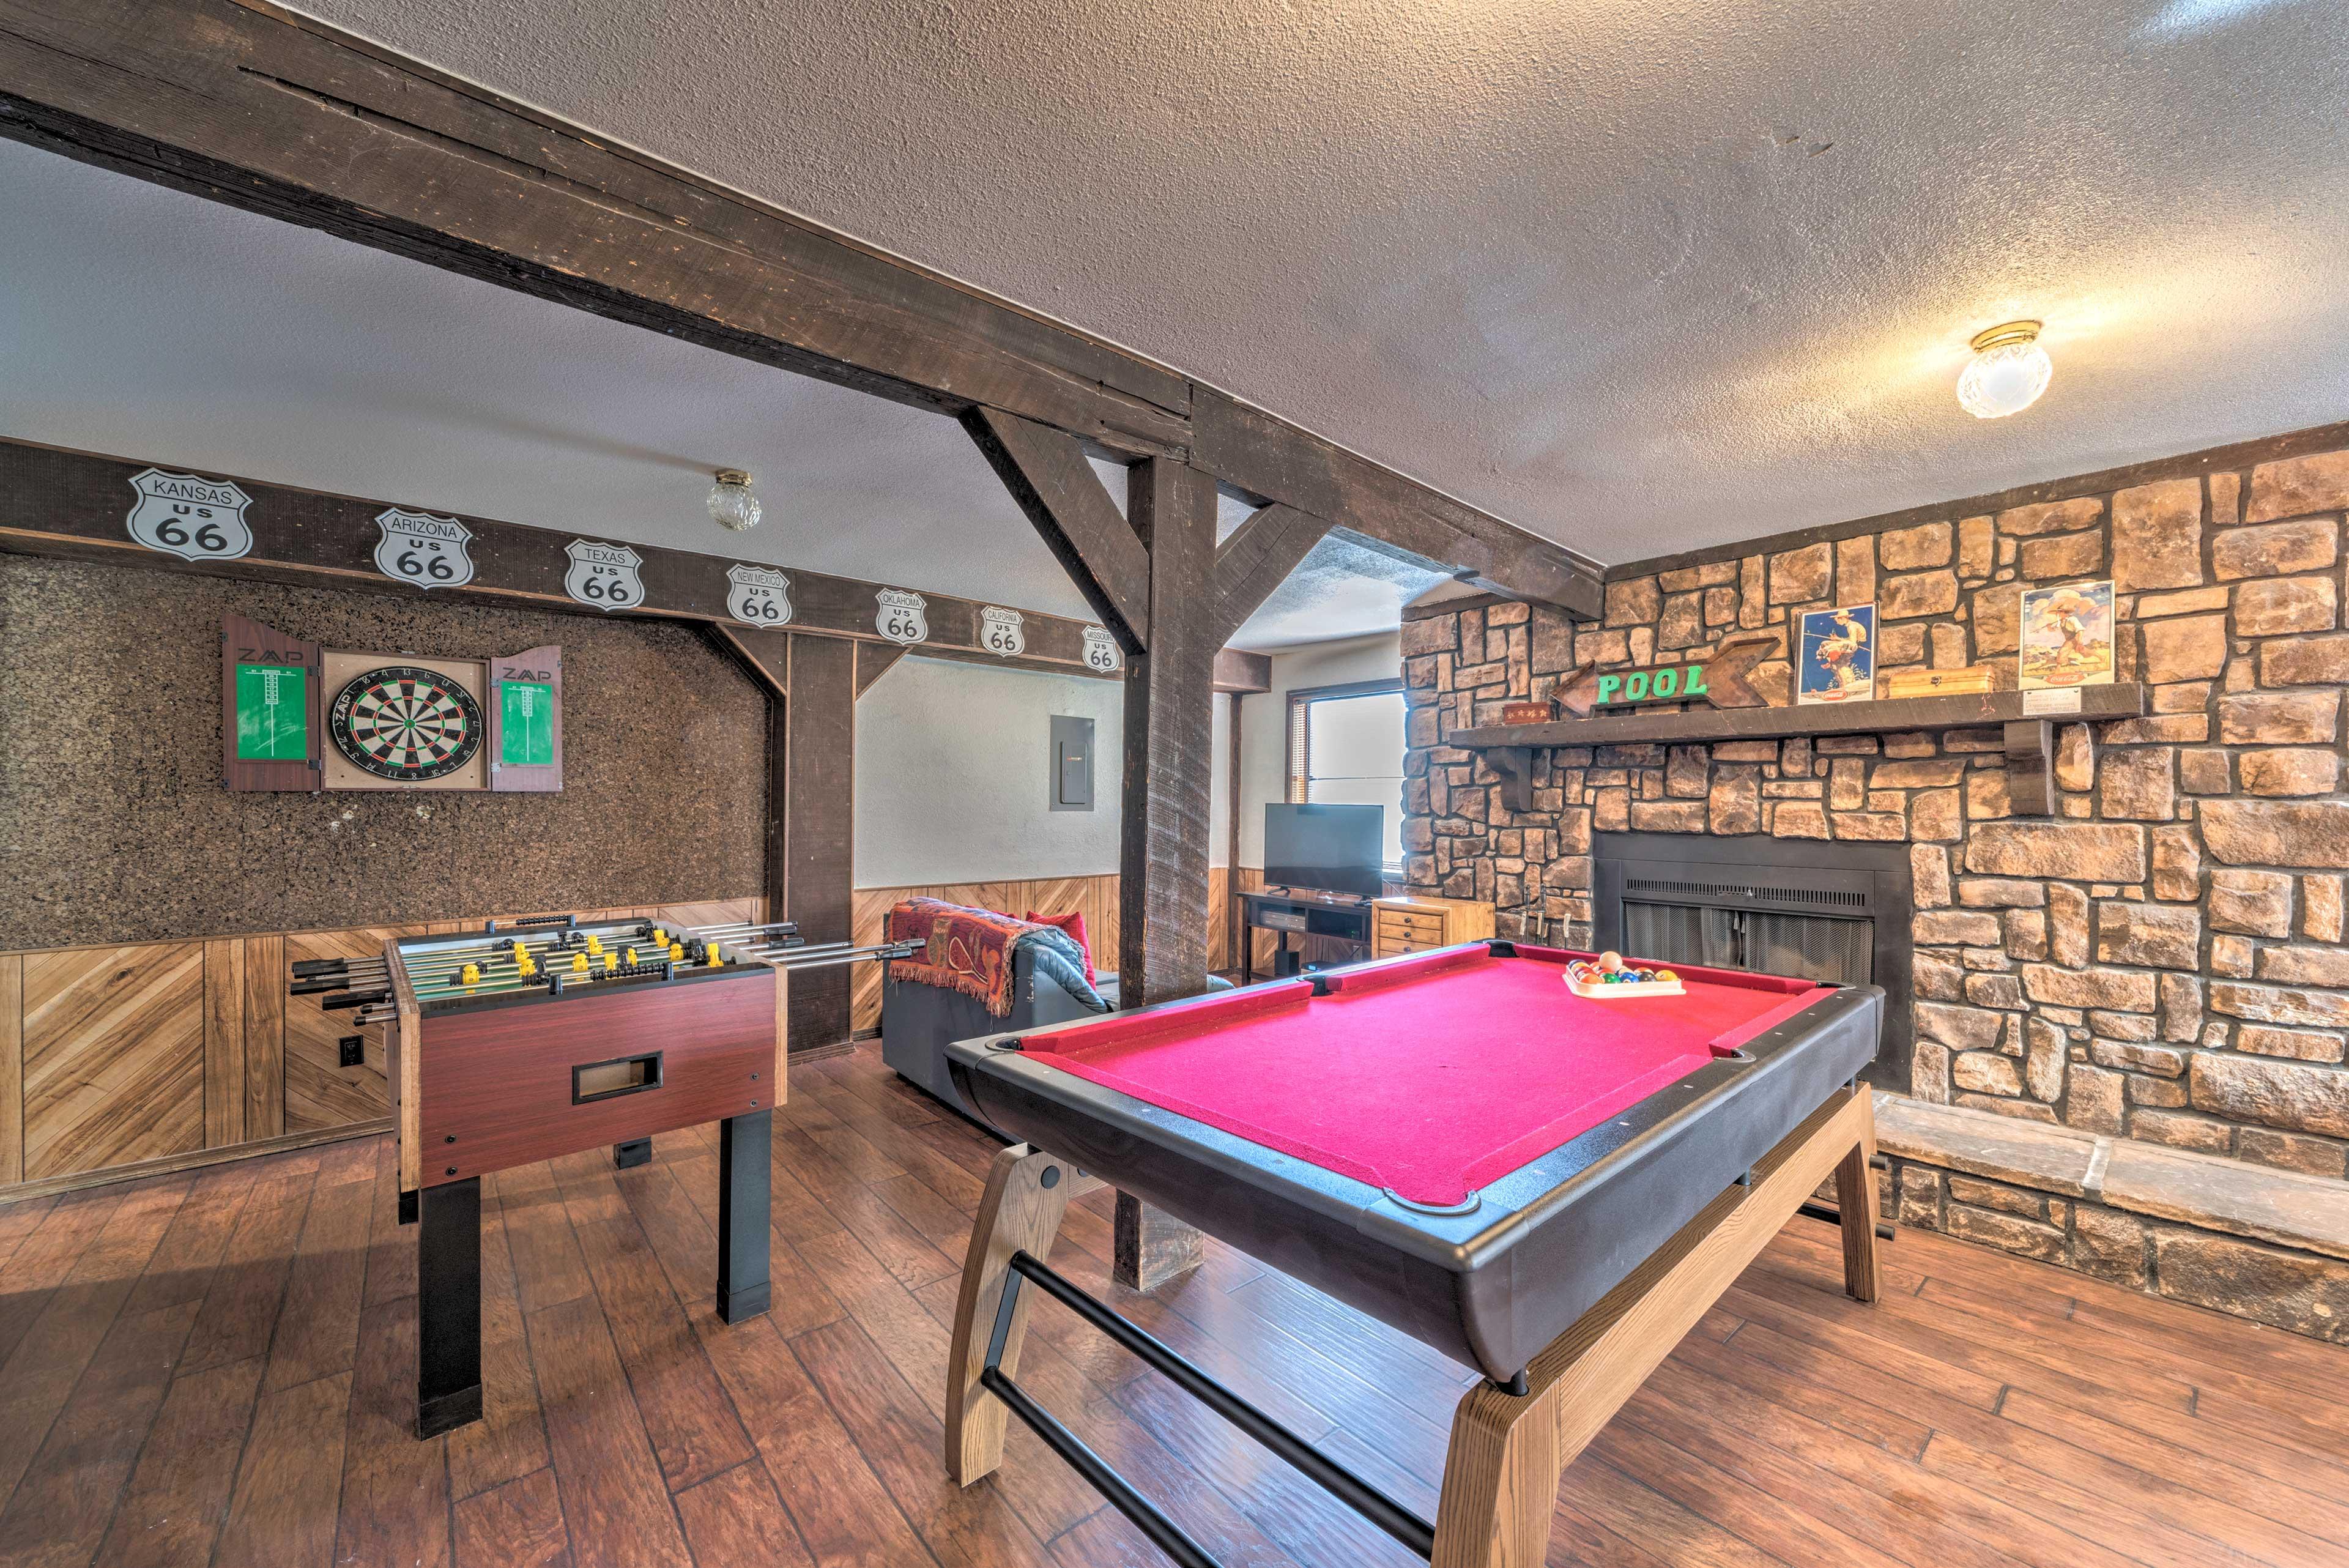 Game Room | Pool Table | Foosball Table | Dart Board